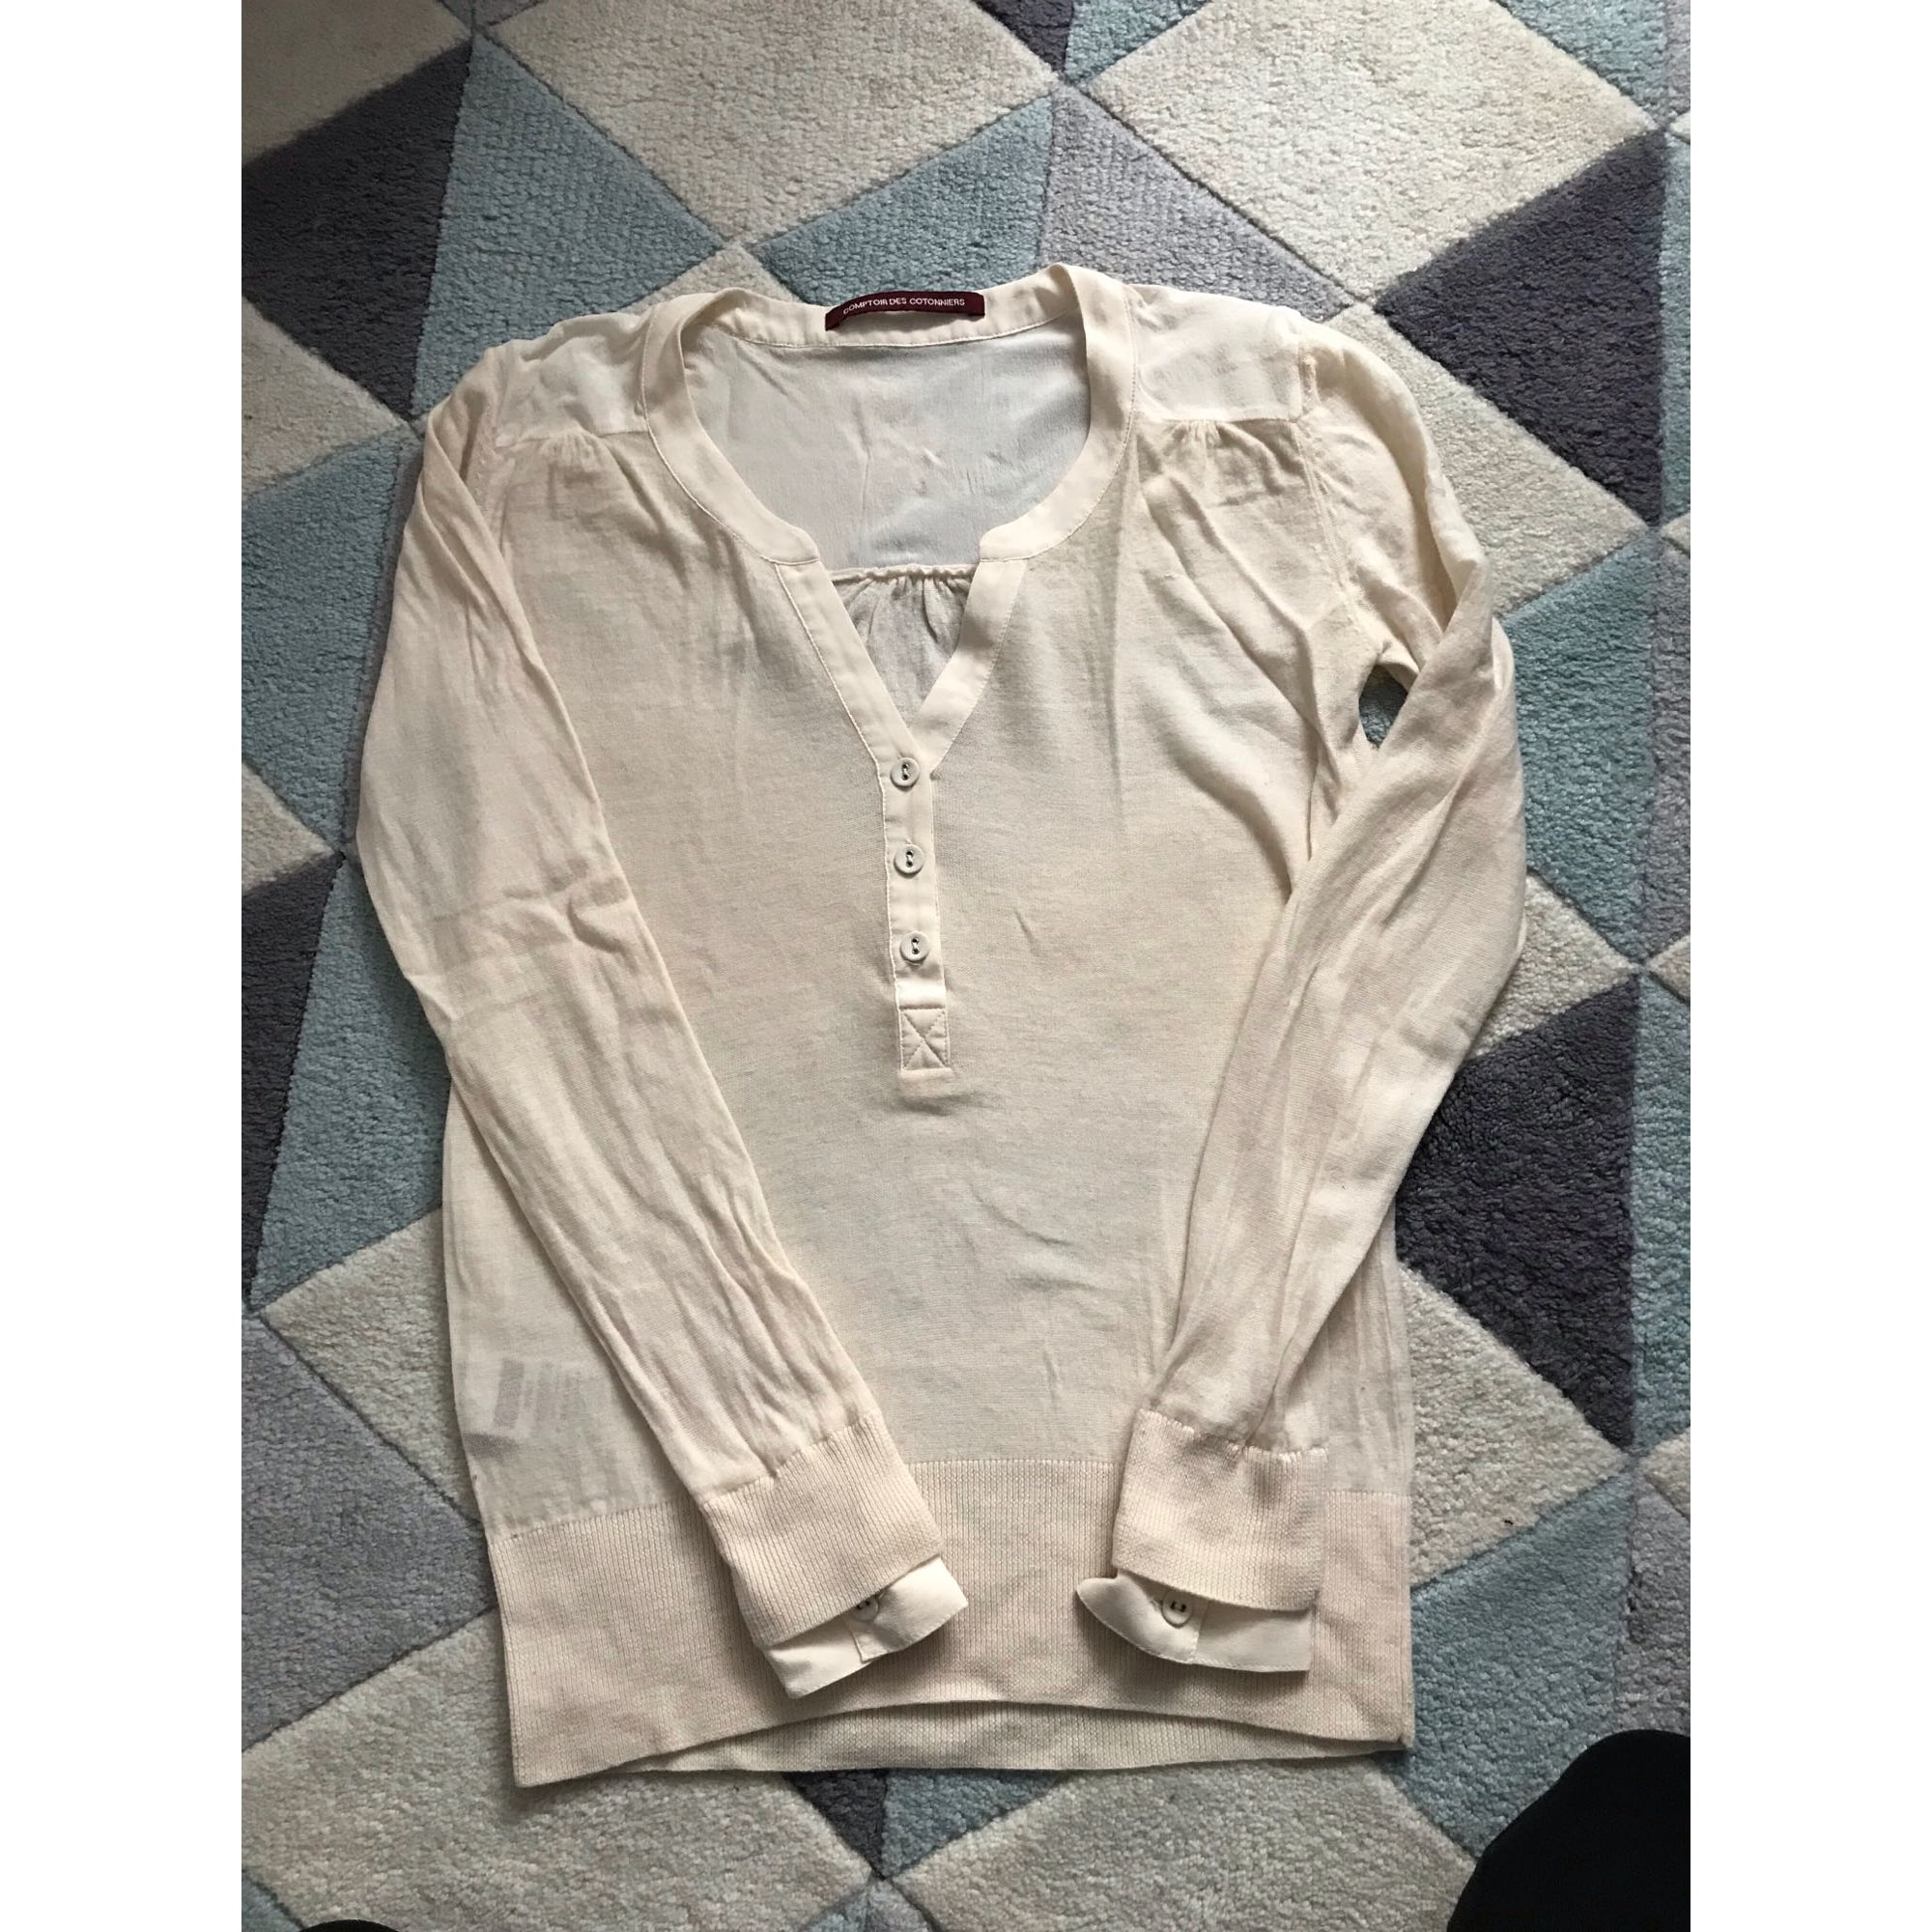 Sweater COMPTOIR DES COTONNIERS White, off-white, ecru